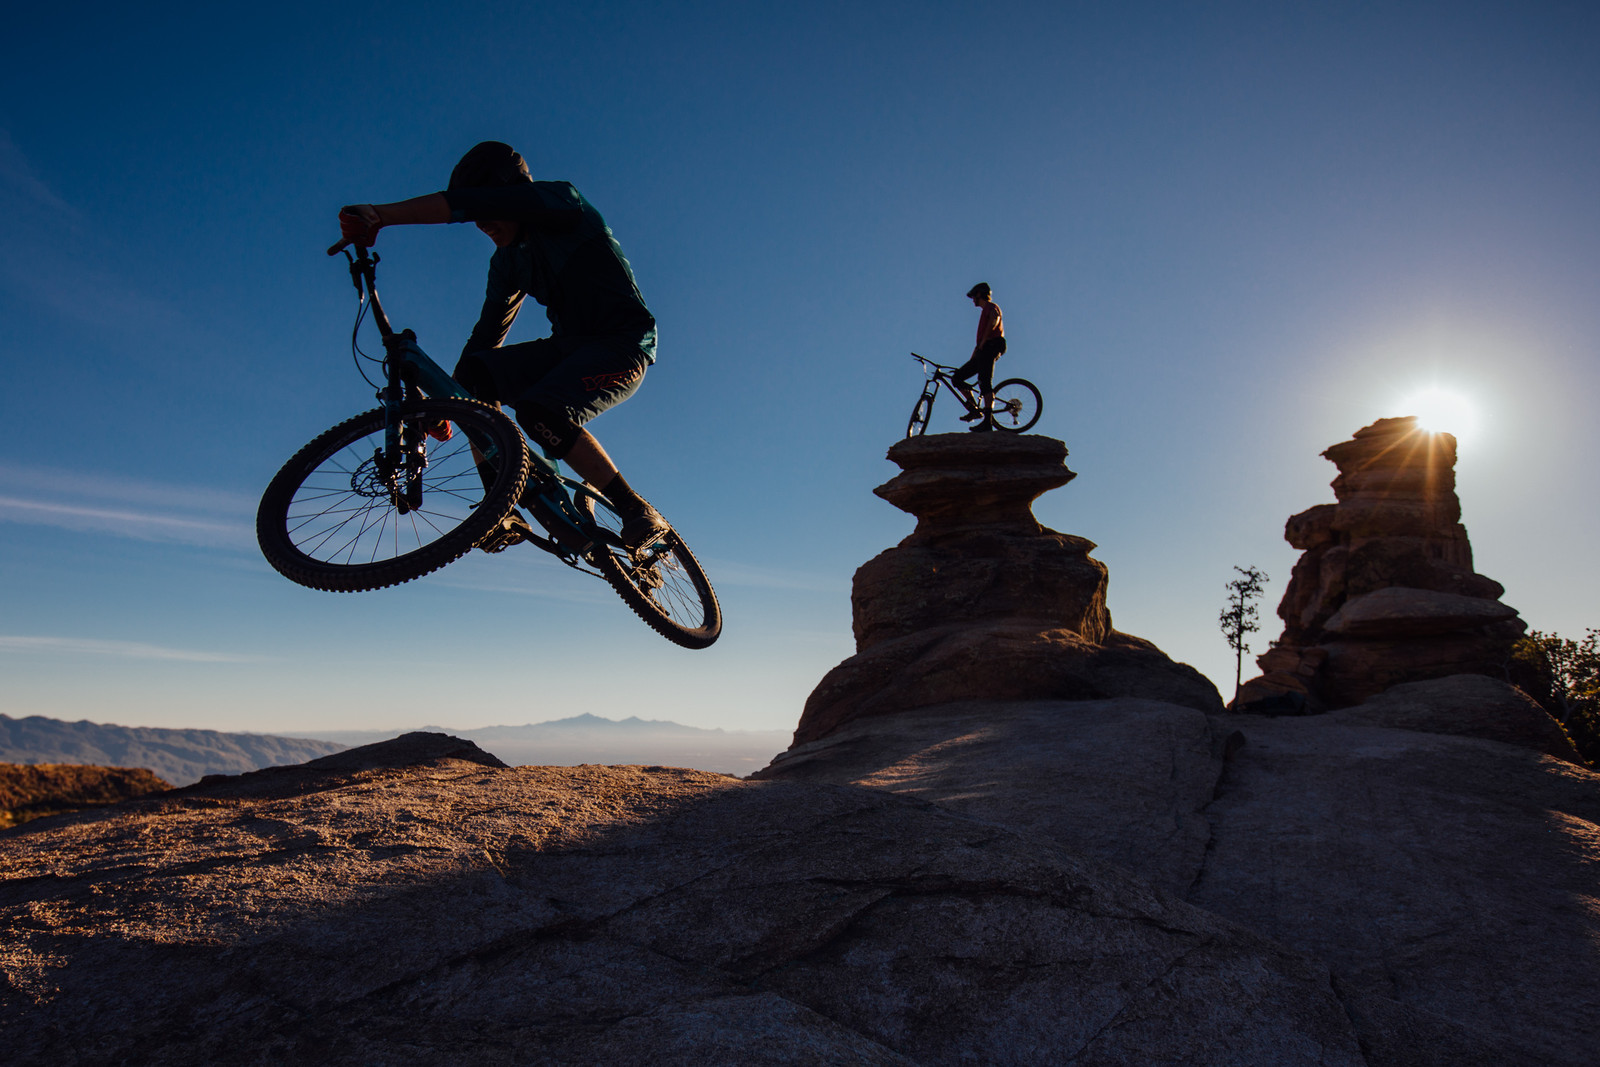 Yeti SB5 Carbon XT / SLX - 2017 Vital MTB Test Sessions - Yeti SB5 Carbon XT / SLX - 2017 Vital MTB Test Sessions - Mountain Biking Pictures - Vital MTB